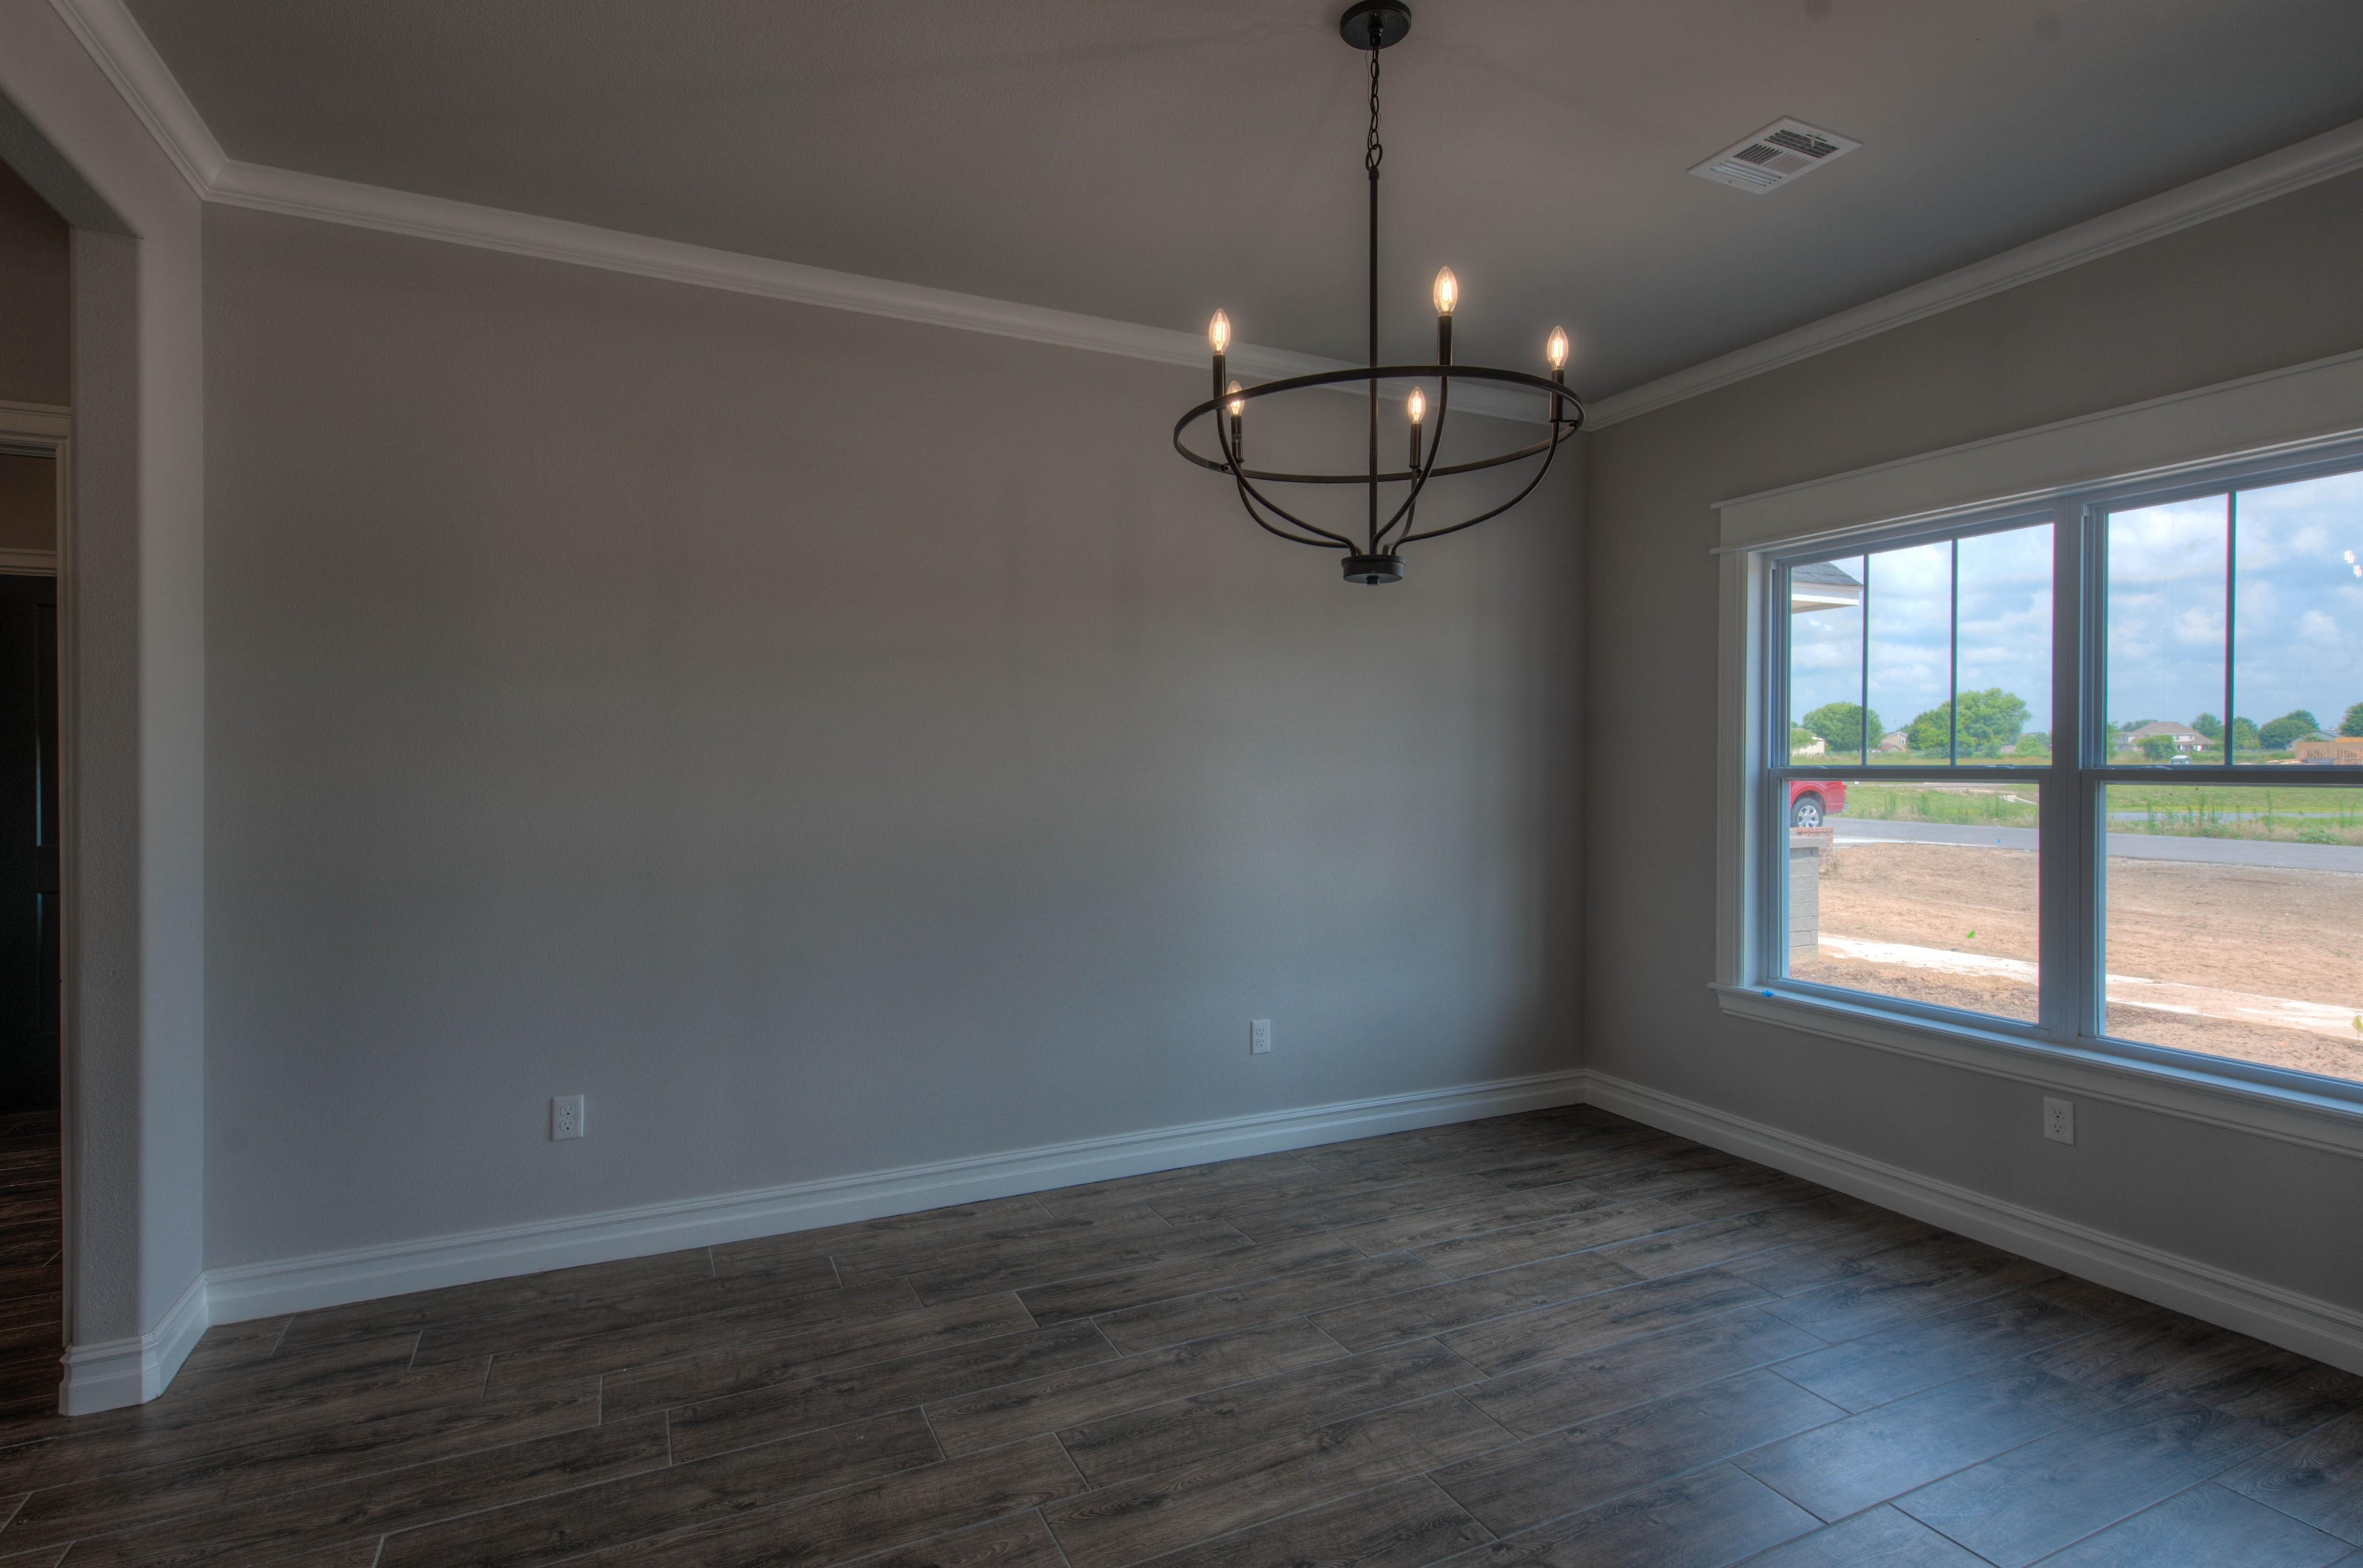 15850 E 107th Street North Property Photo 6